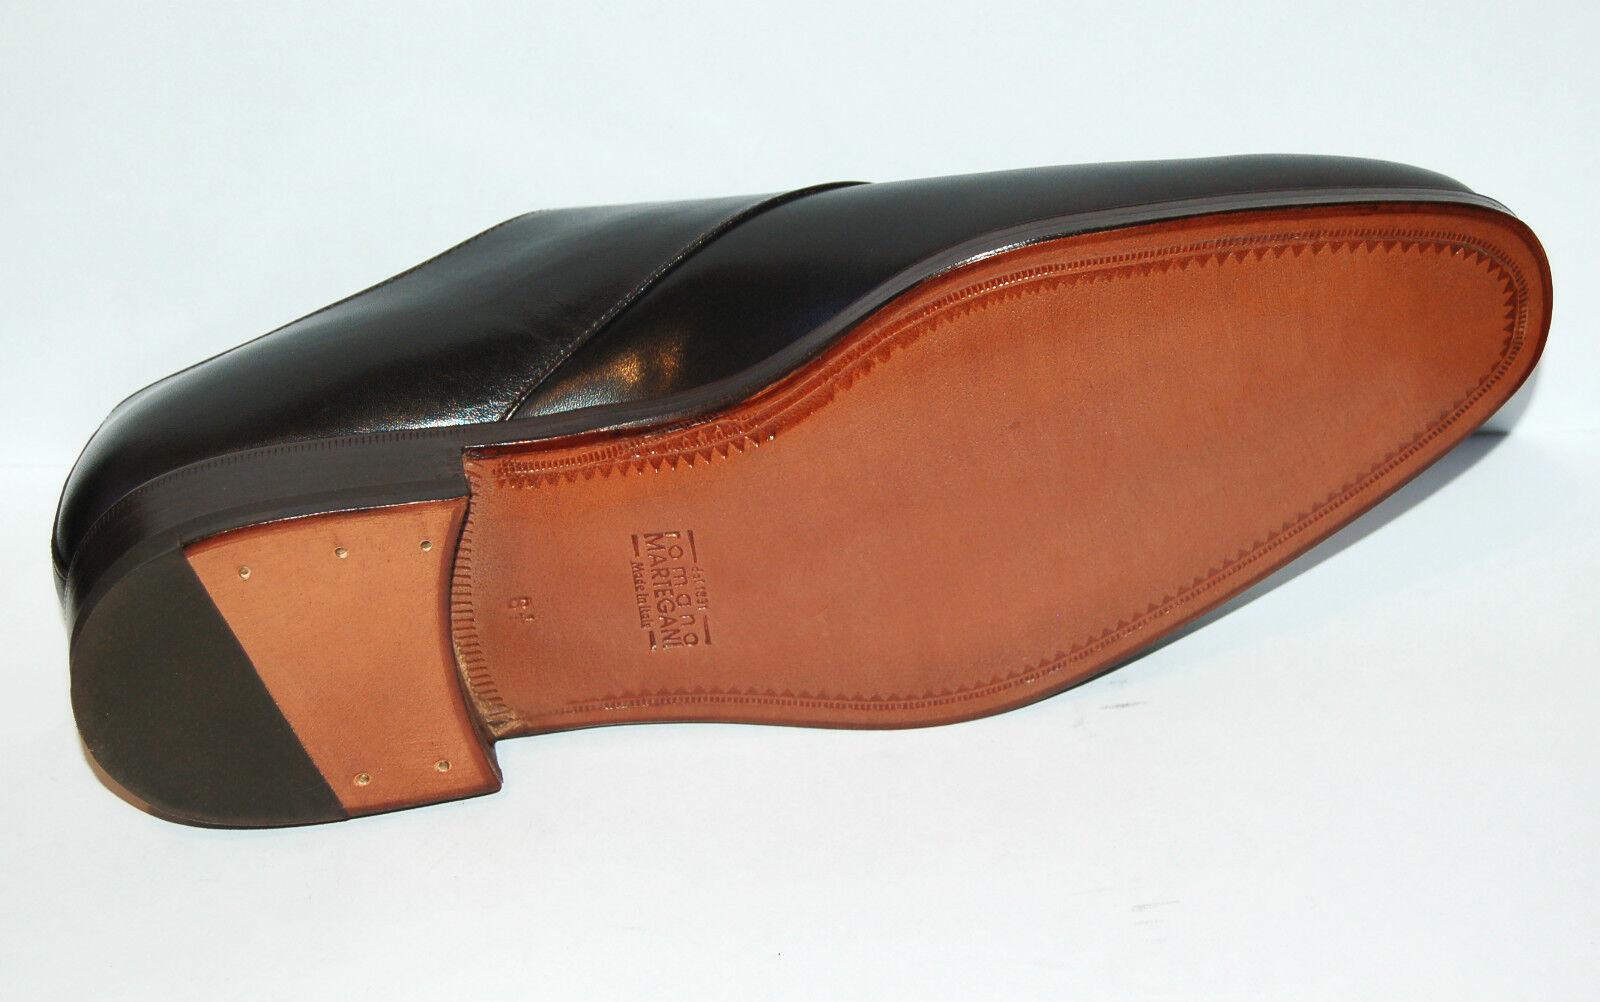 MAN - 8½EU - BUCKLE OXFORD OXFORD OXFORD - HEAD BROWN CALF - LEATHER SOLE+BLAKE CST 5f80a9